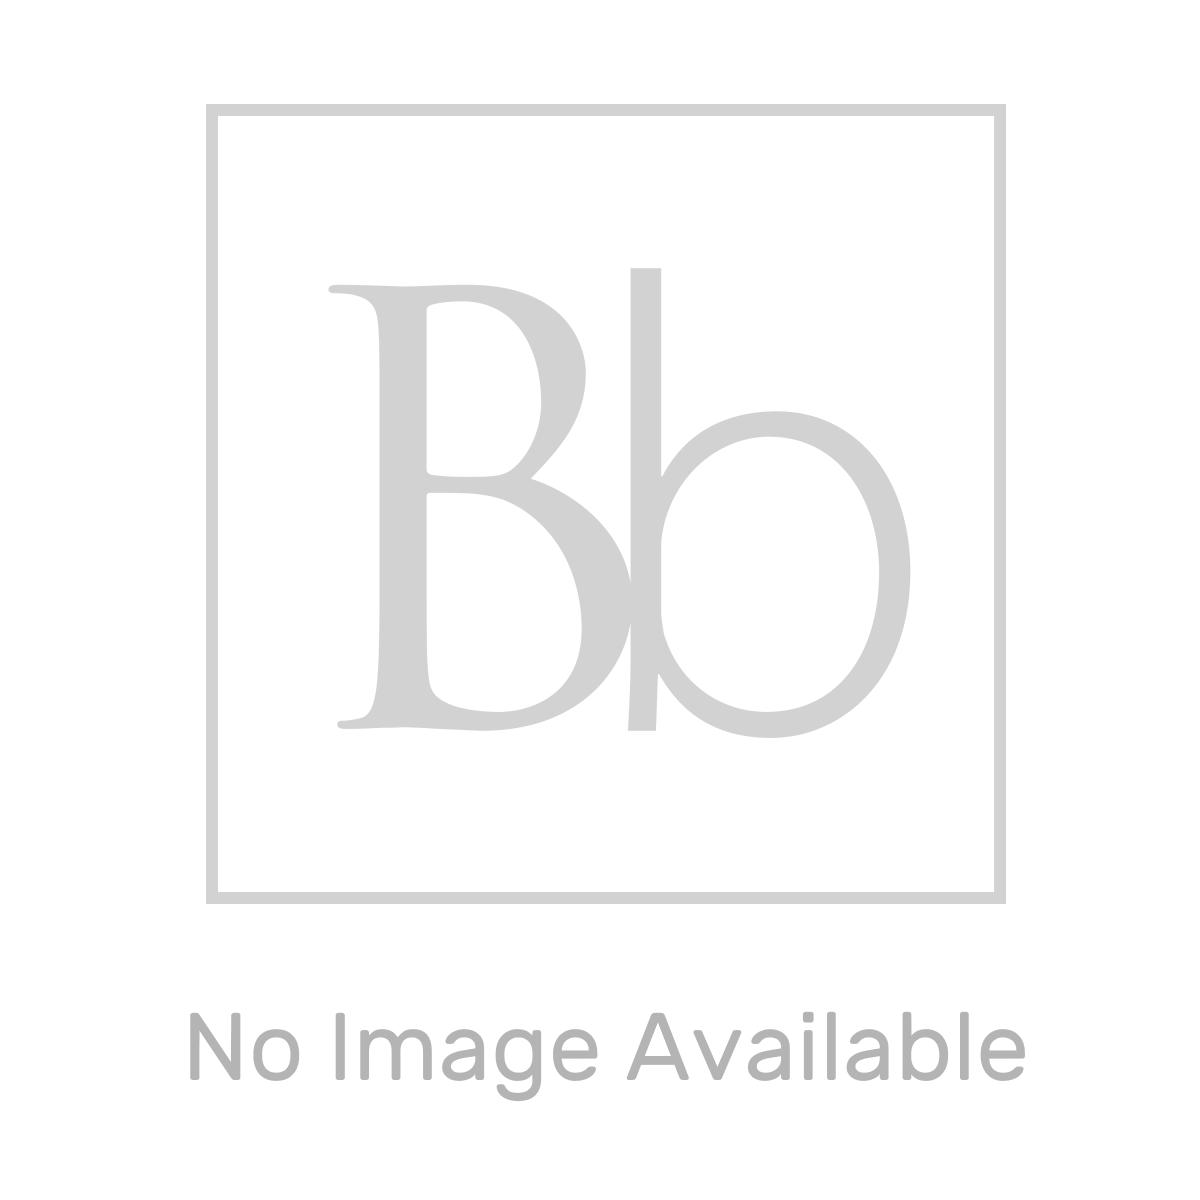 Elation Kiyo Graphite Gloss Vanity Unit 550mm